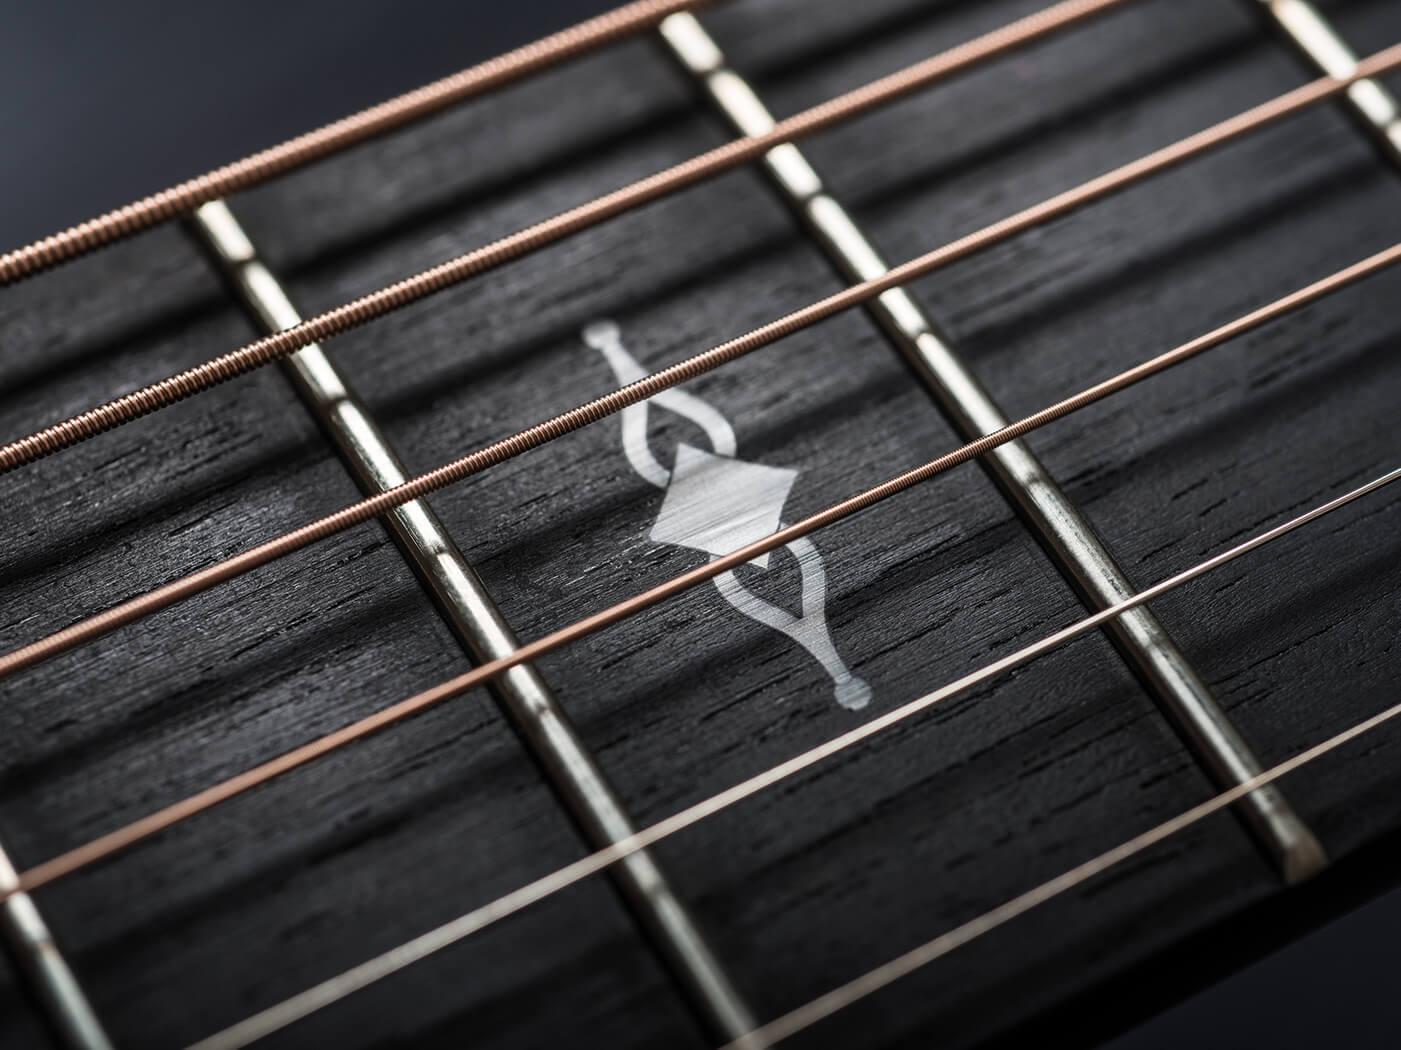 Taylor 322ce fingerboard close up